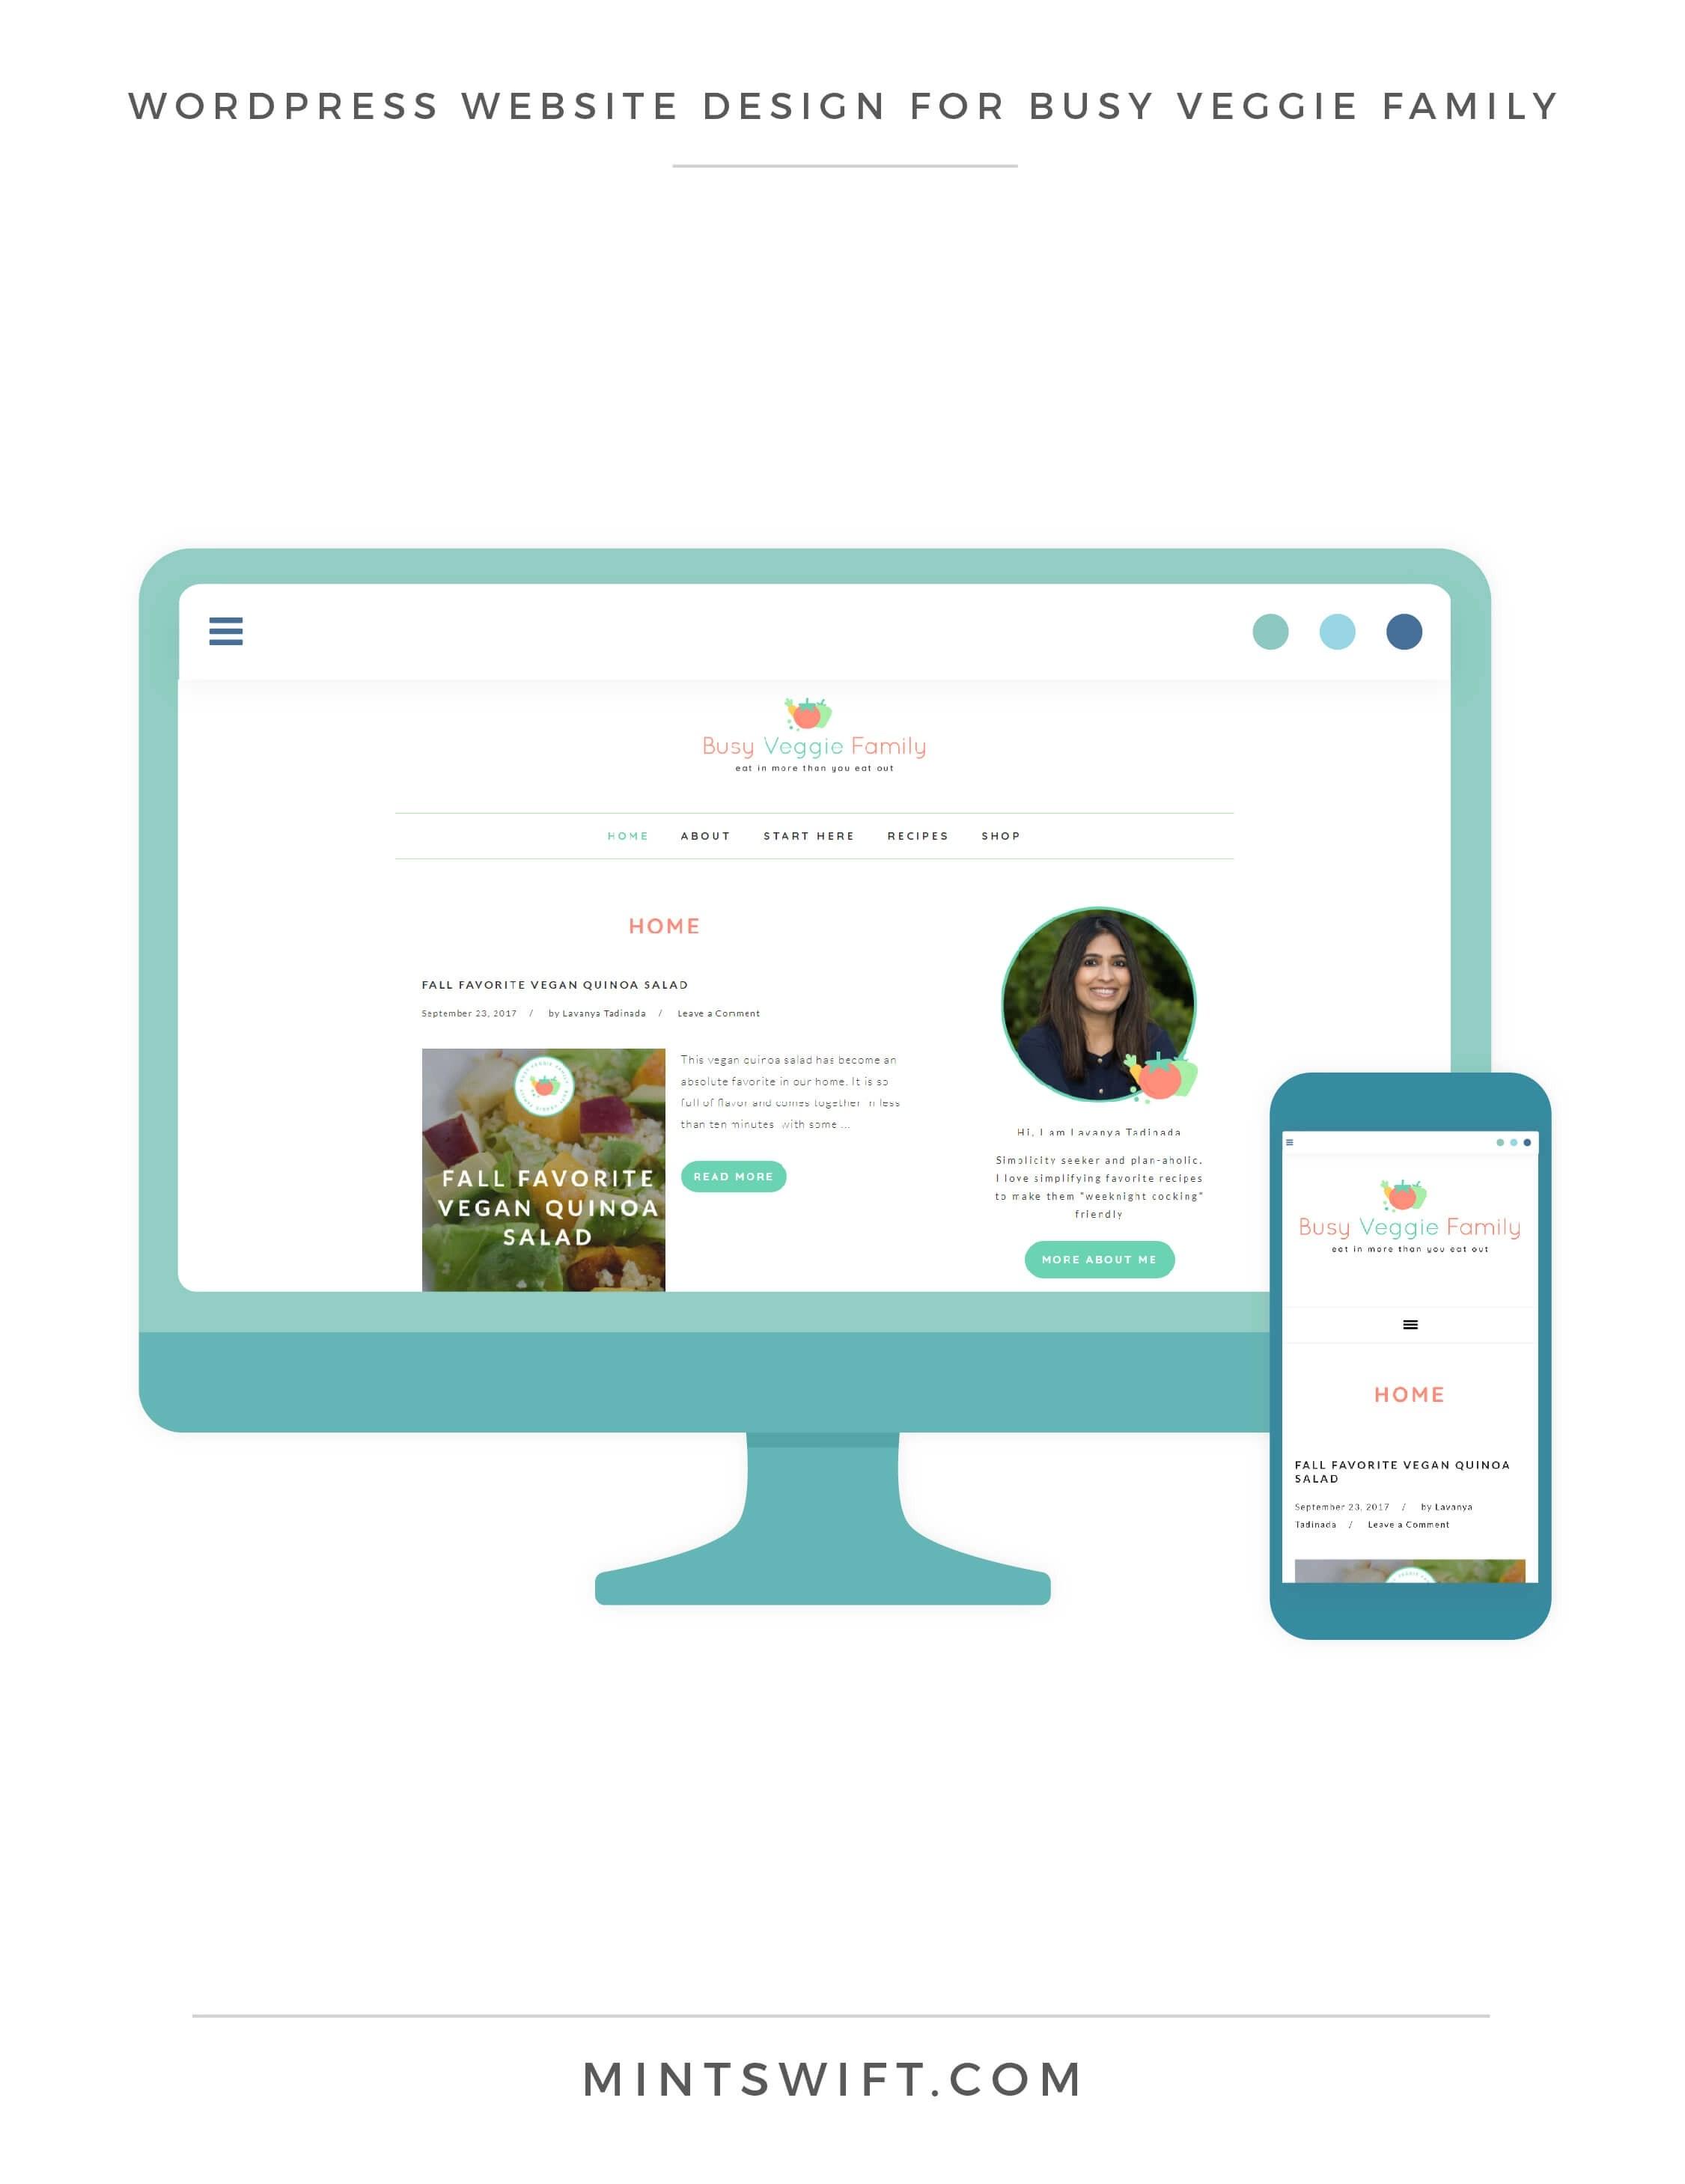 WordPress Website Design for Busy Veggie Family - MintSwift